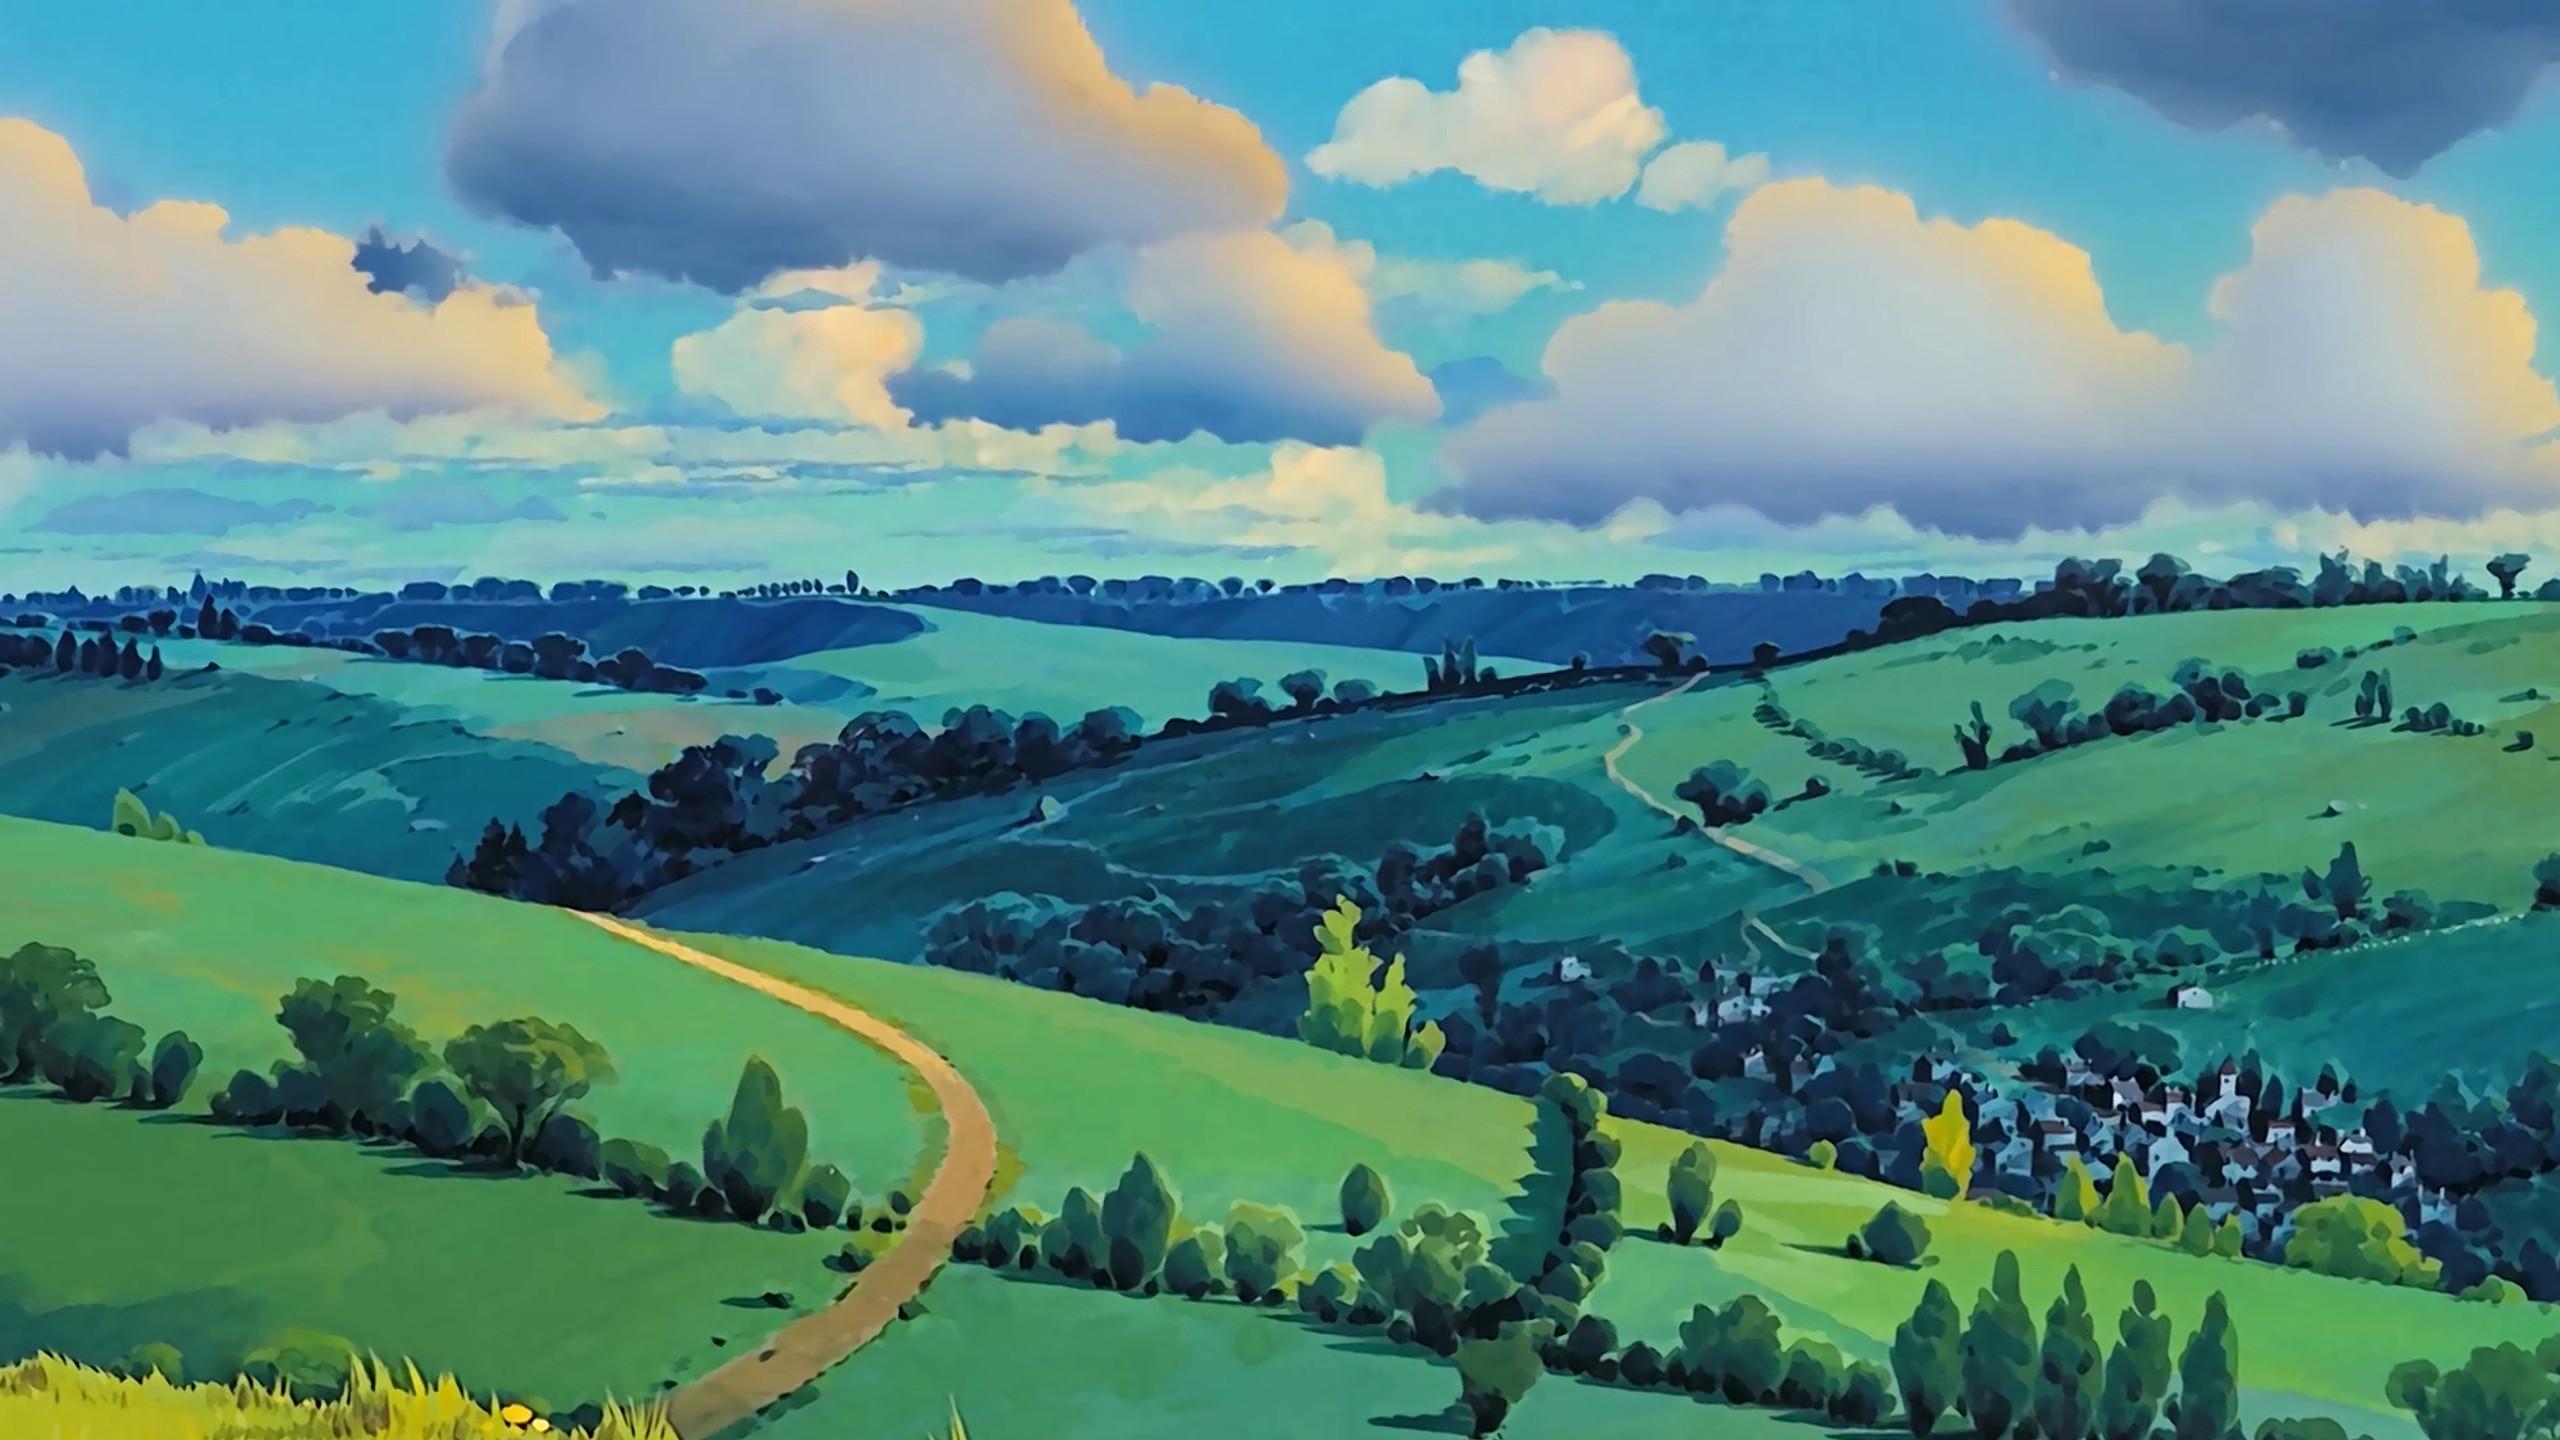 Celebrate The 75th Birthday Of Hayao Miyazaki With These: Miyazaki Wallpapers (69+ Images